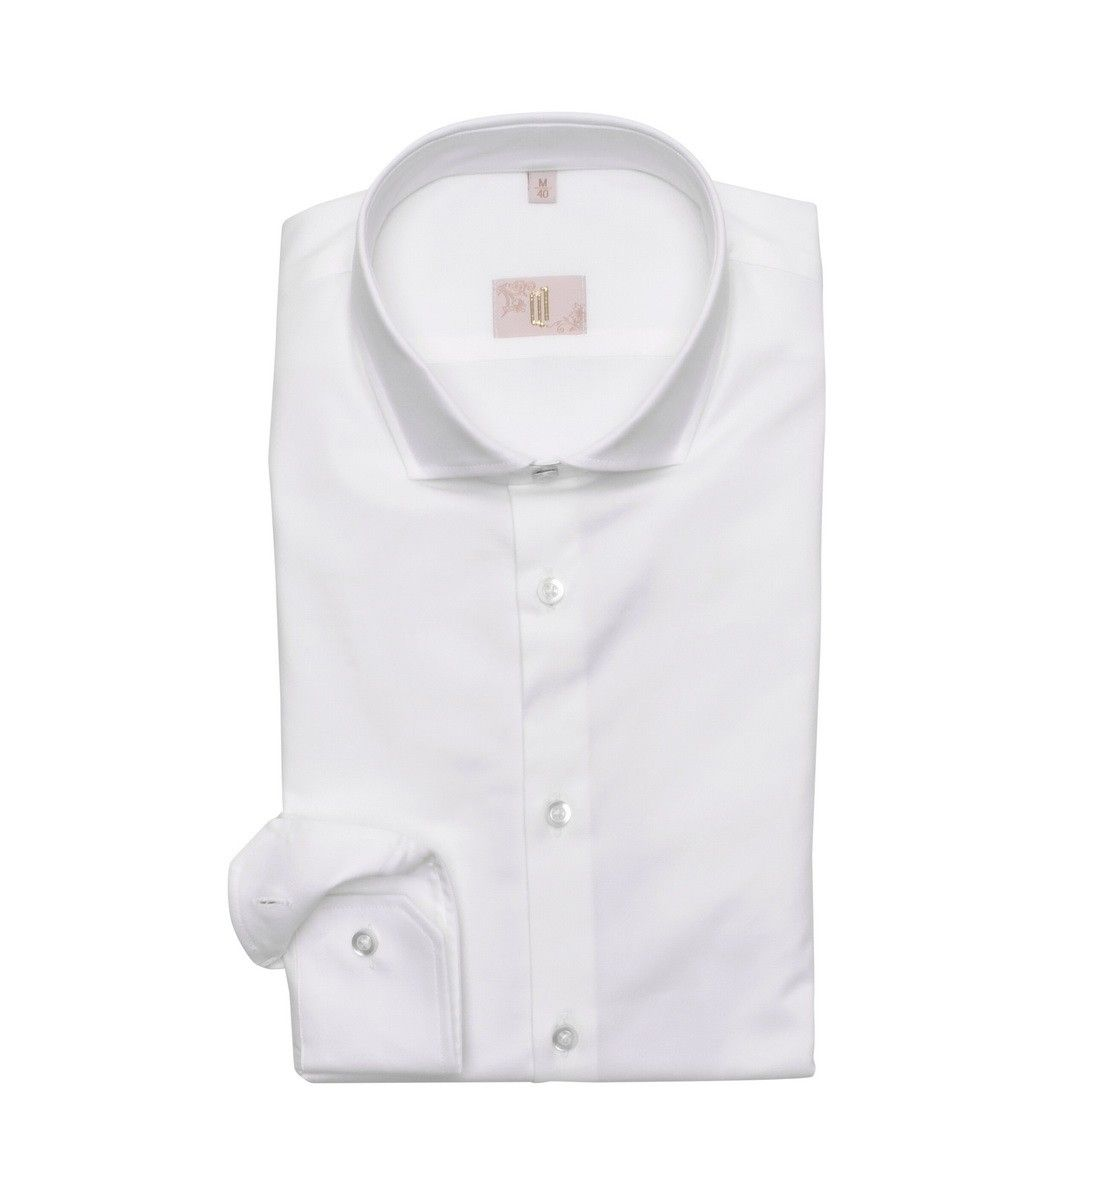 Q1 - Herren Hemd - Hemd Slim Fit - Weiß